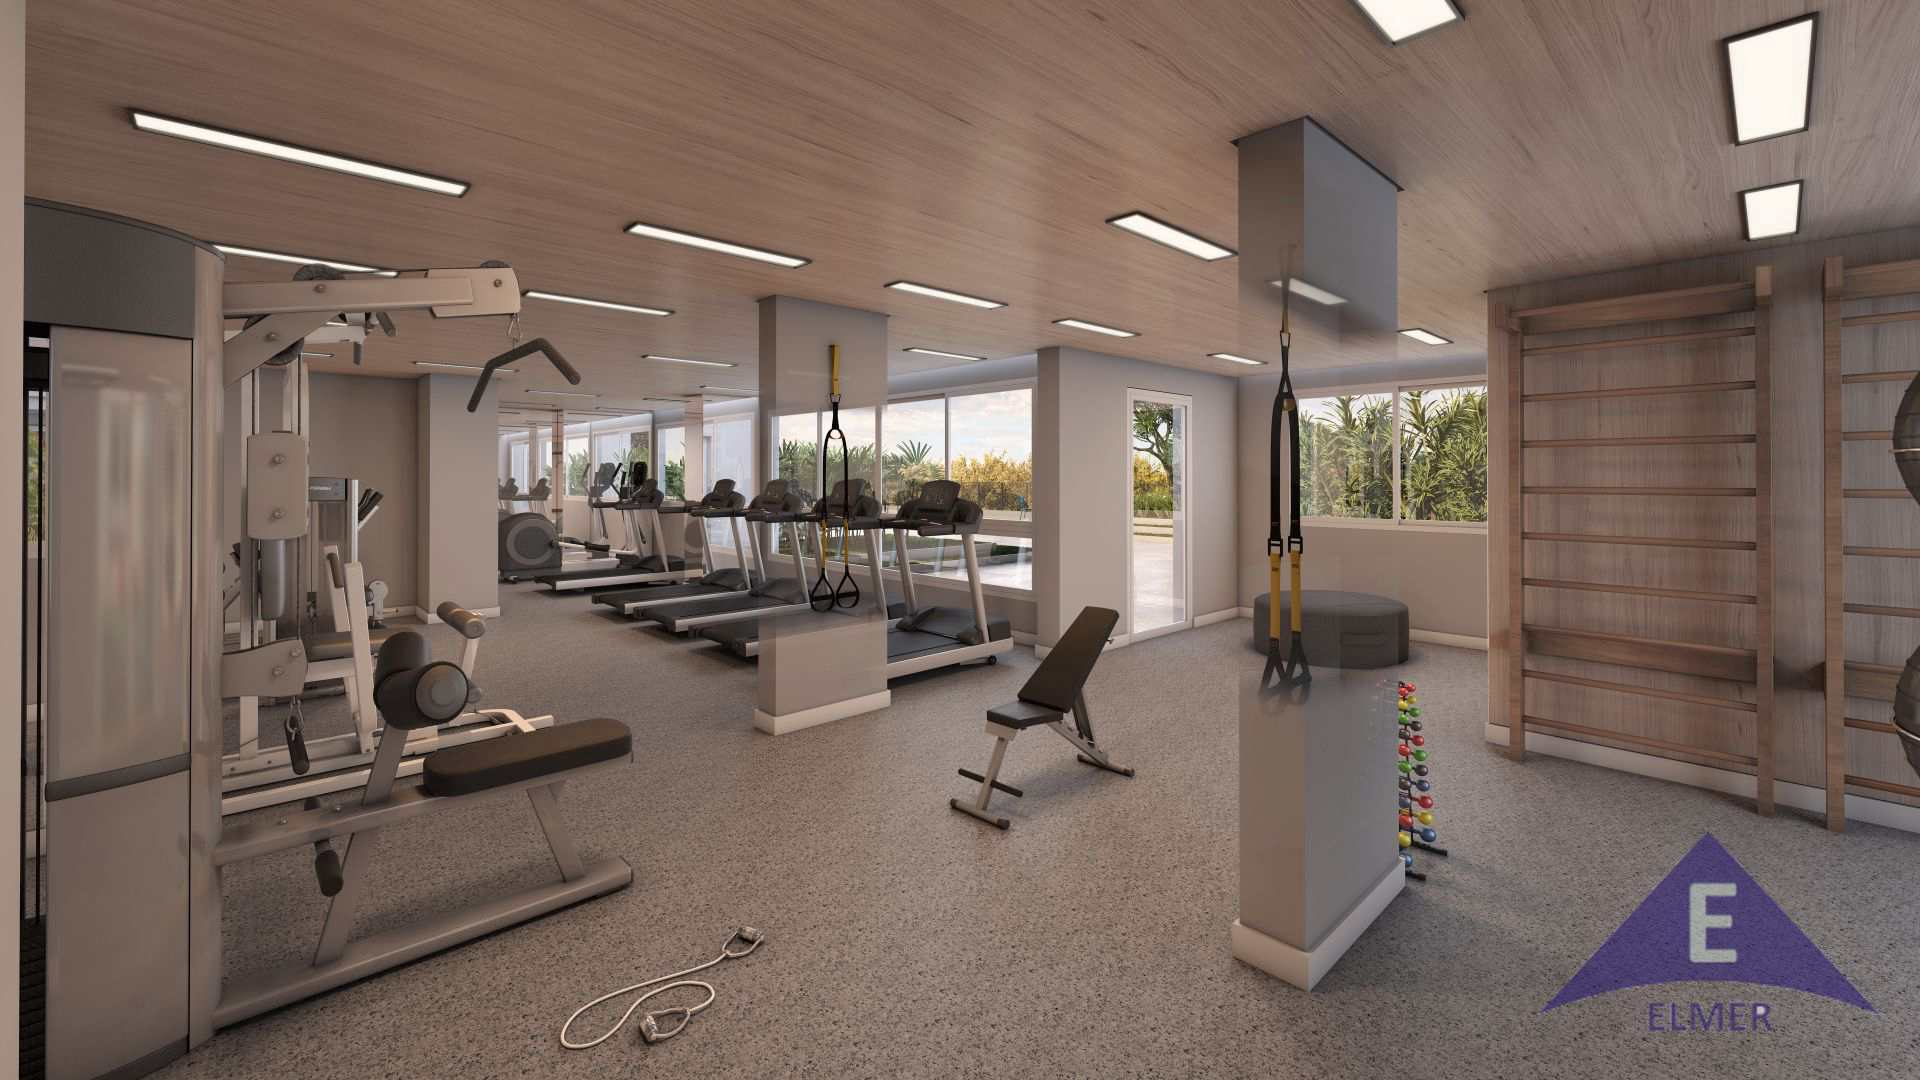 batch_Imagem-Ilustrativa-Fitness-Torre-2-Buriti-RA43-Raiz-SP